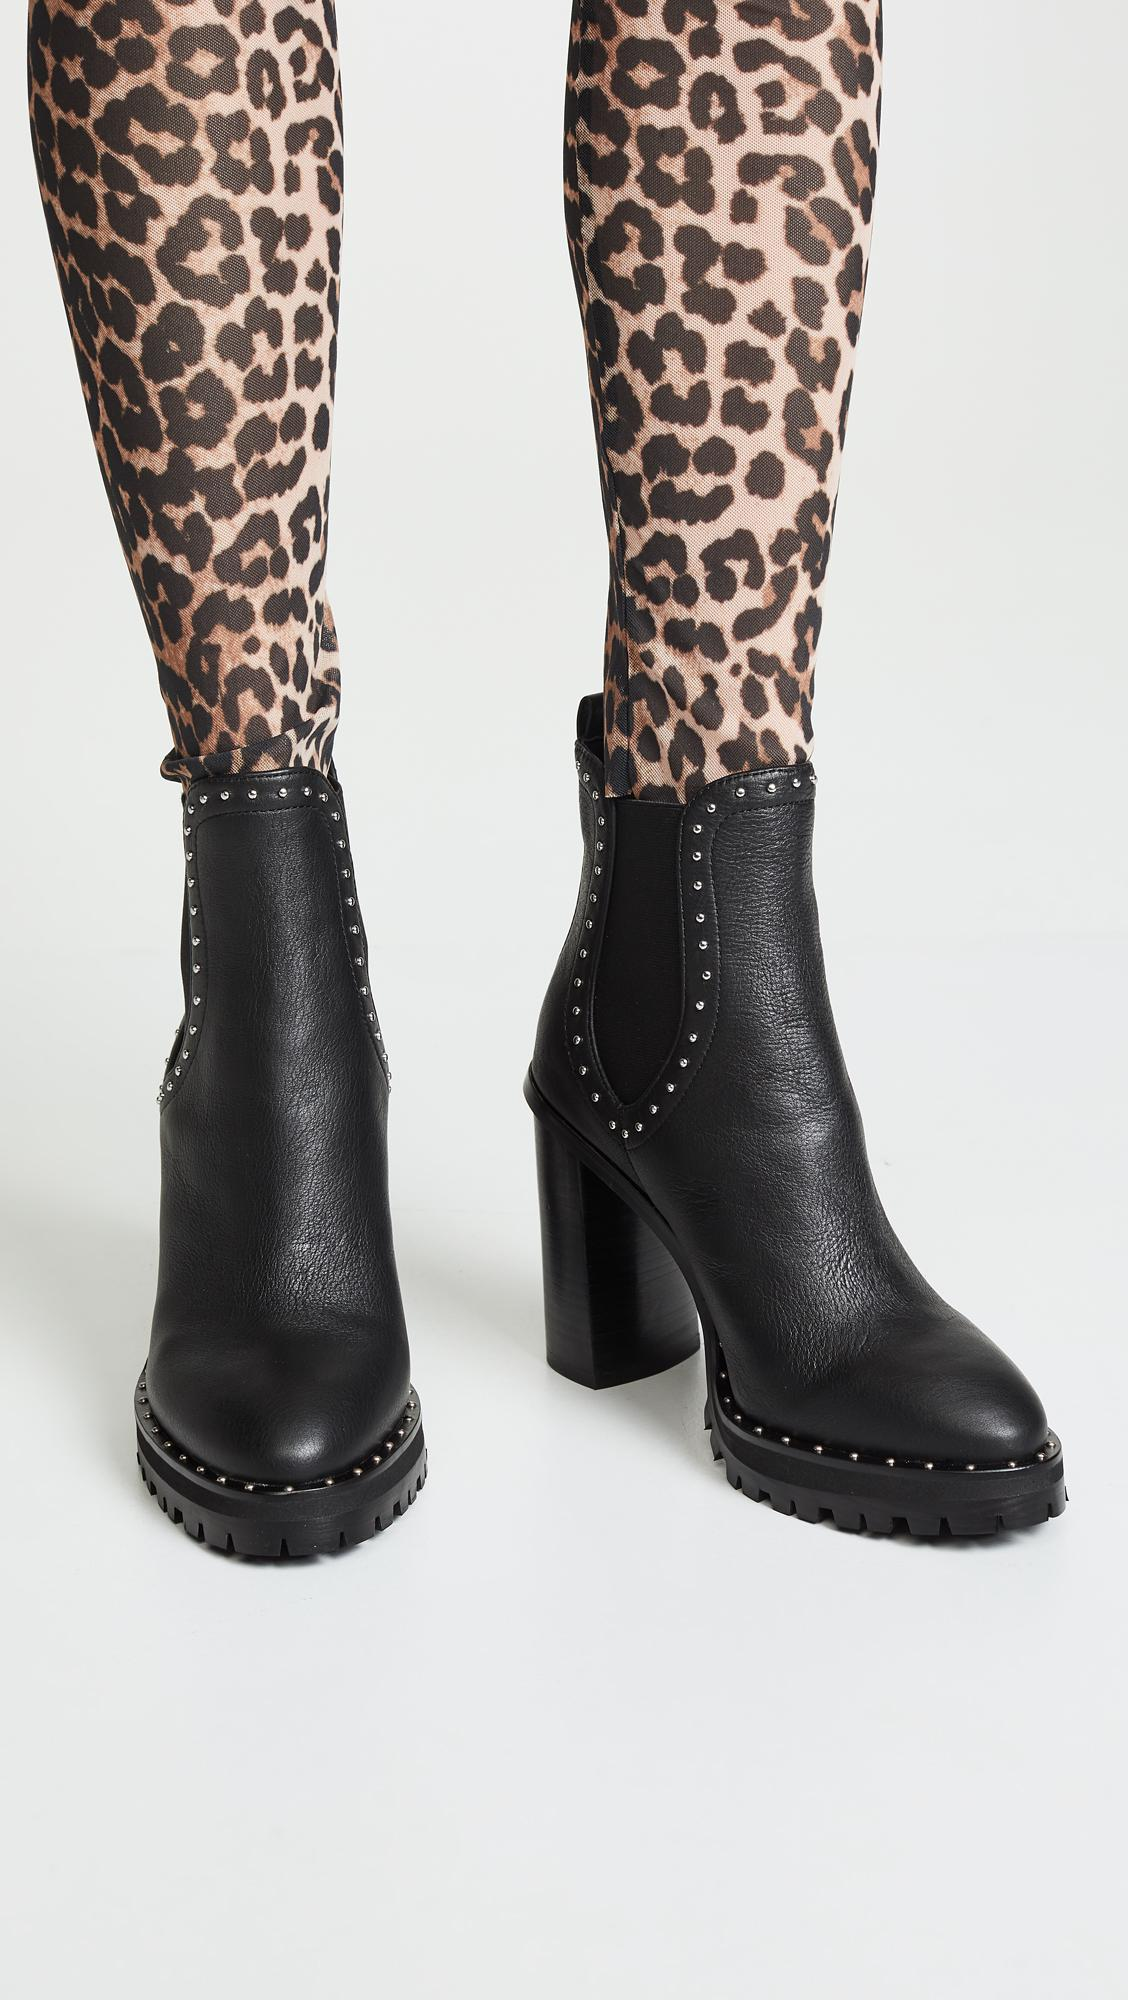 e7646a5284c Rebecca Minkoff - Black Edolie Block Heel Chelsea Boots - Lyst. View  fullscreen